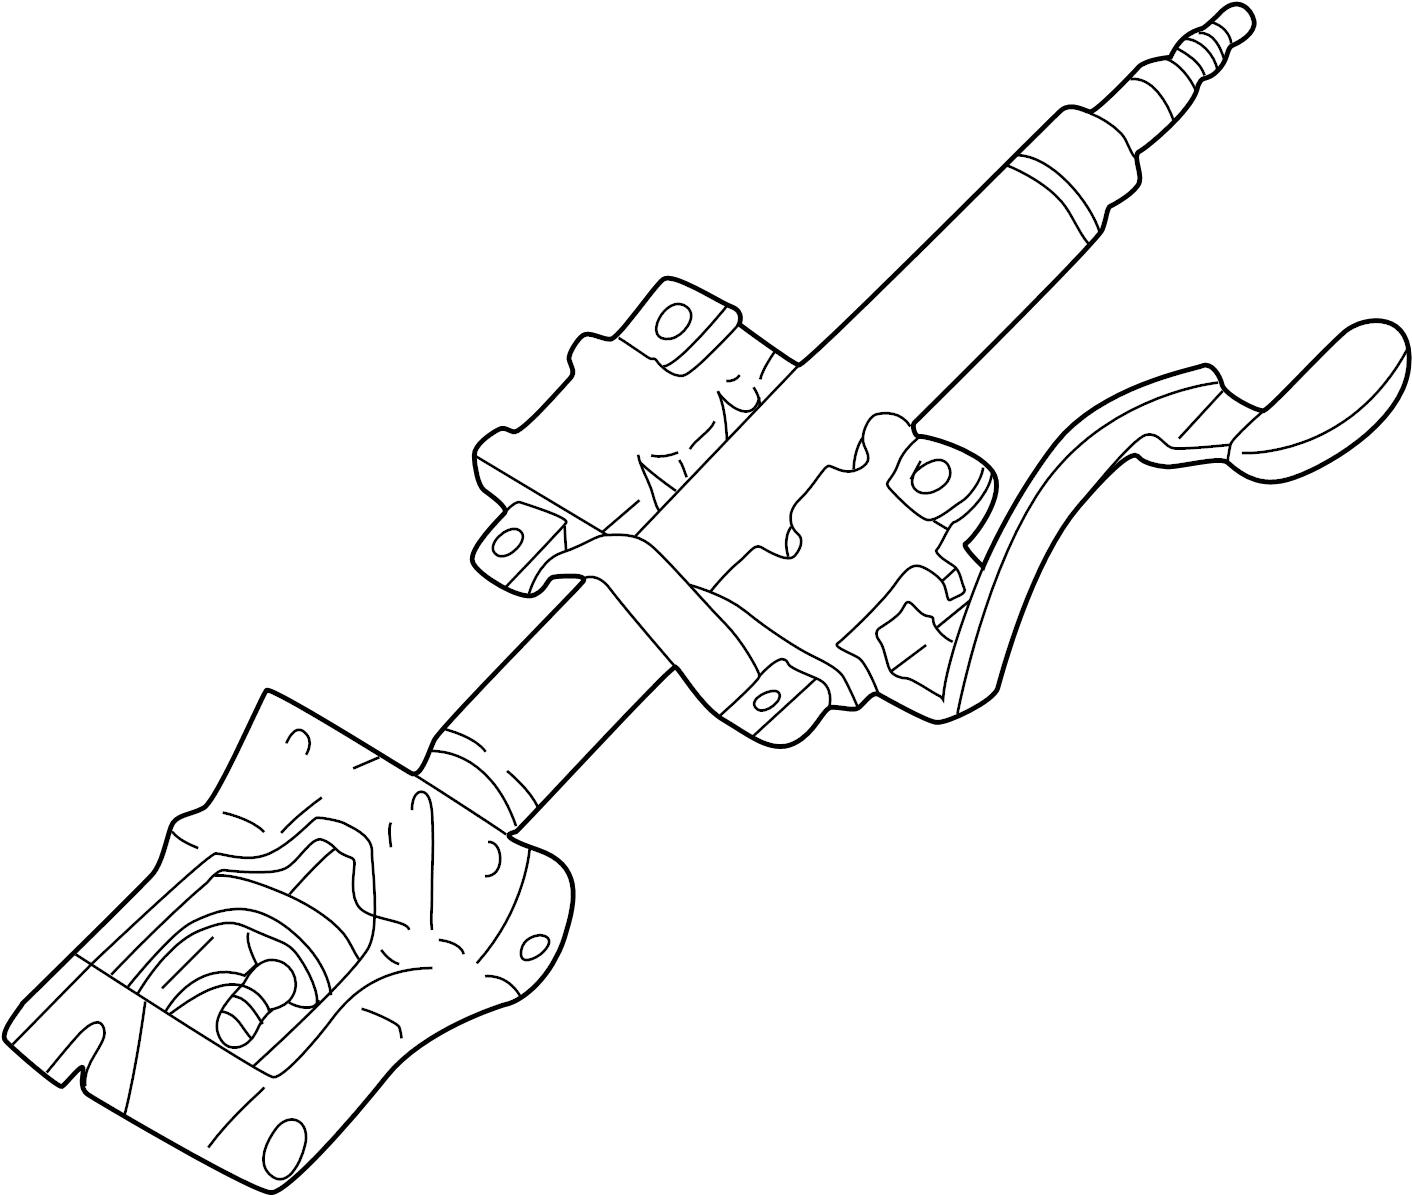 Mazda 626 Steering Column. 626, MX-6. To 5/29/98. WHEEL